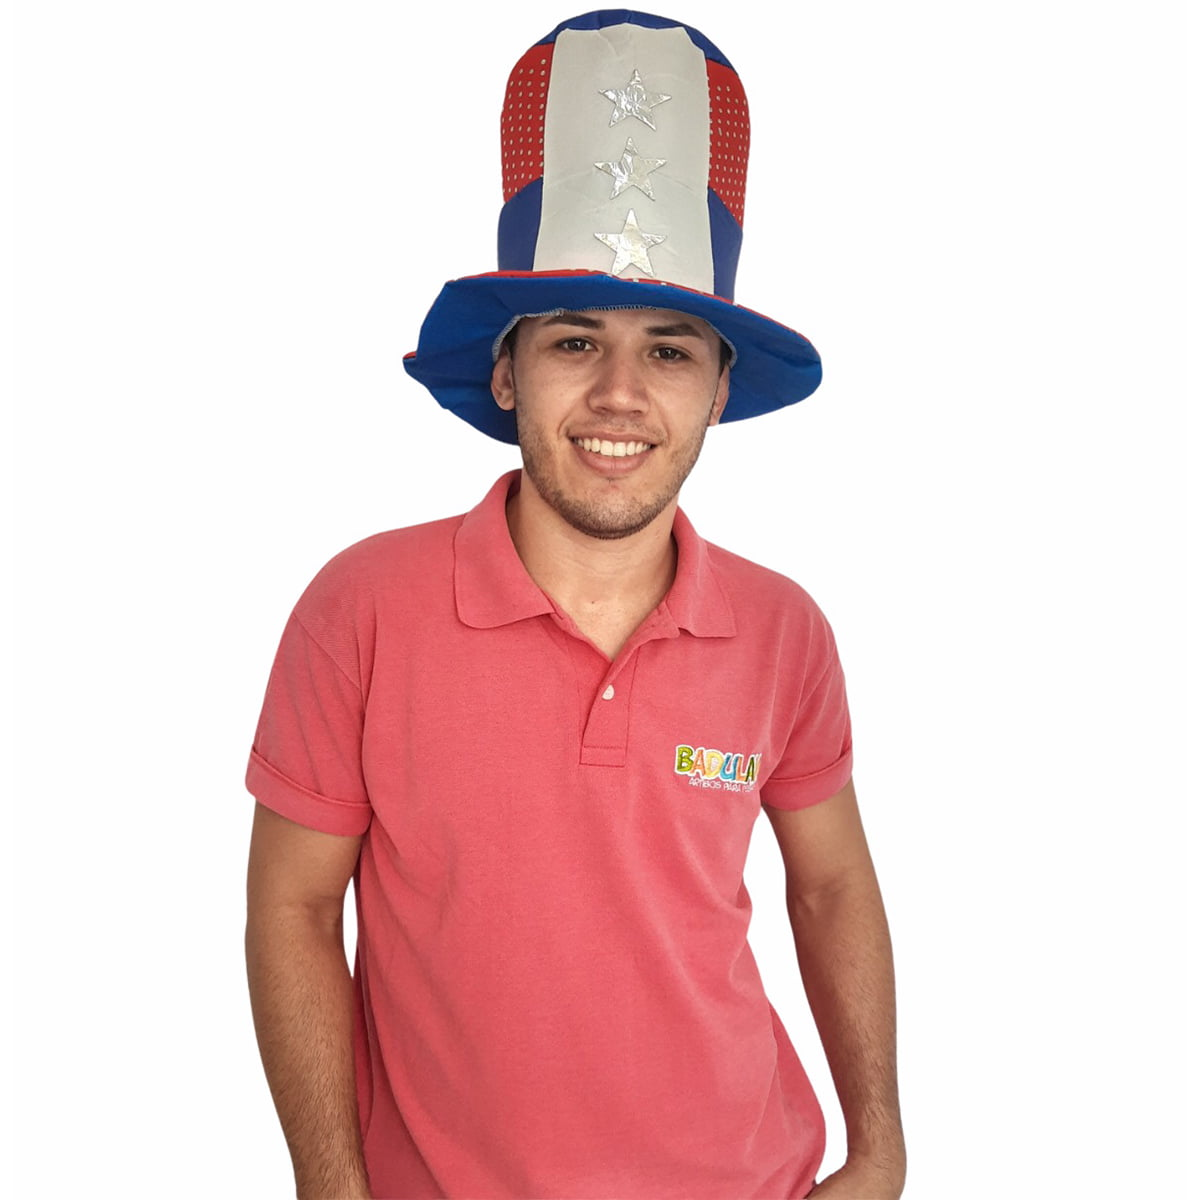 Cartola Americana para Festas Carnaval